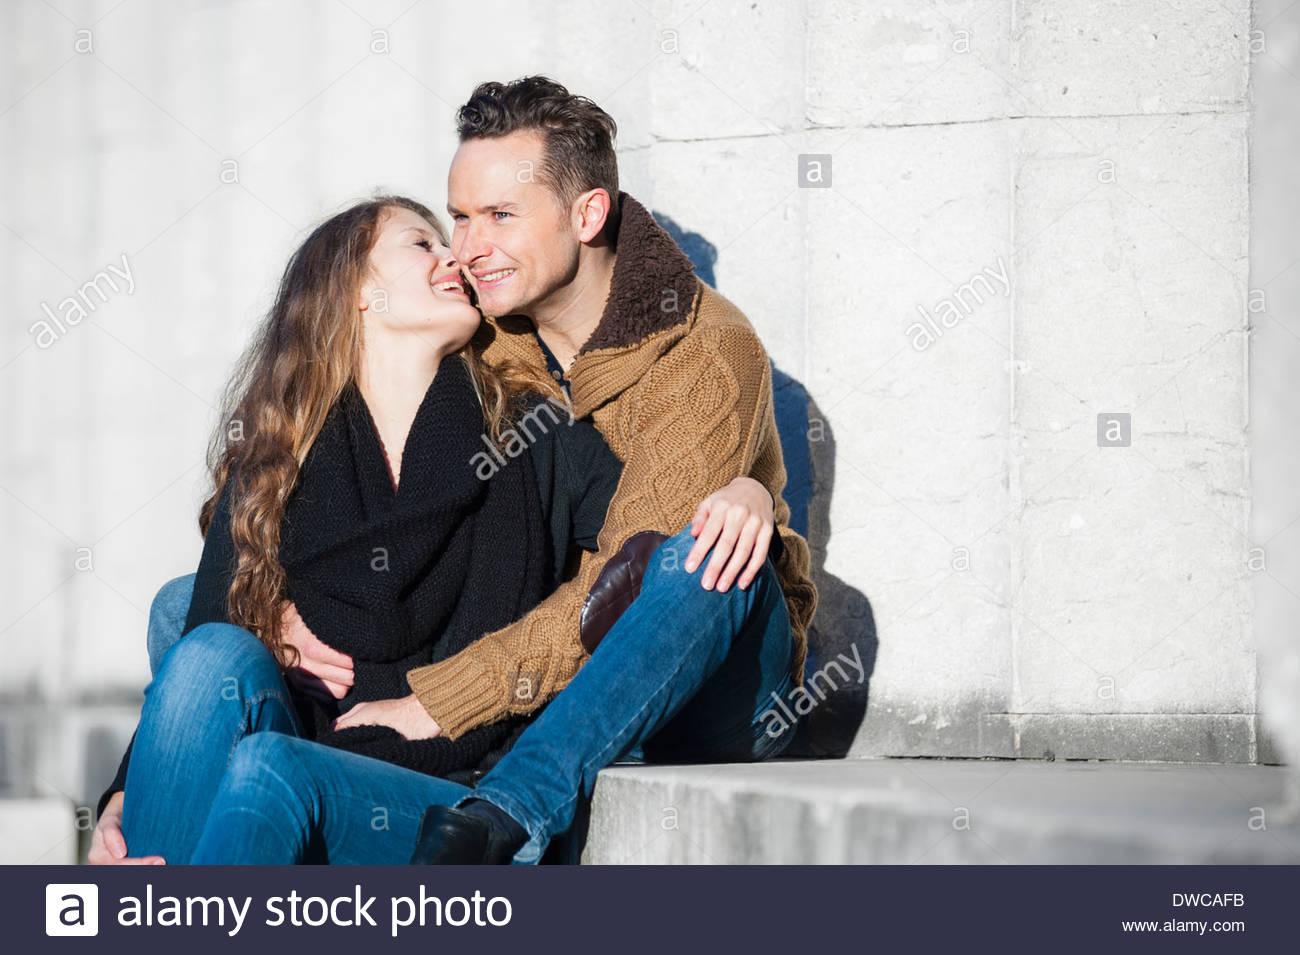 Romantic couple sitting on steps - Stock Image